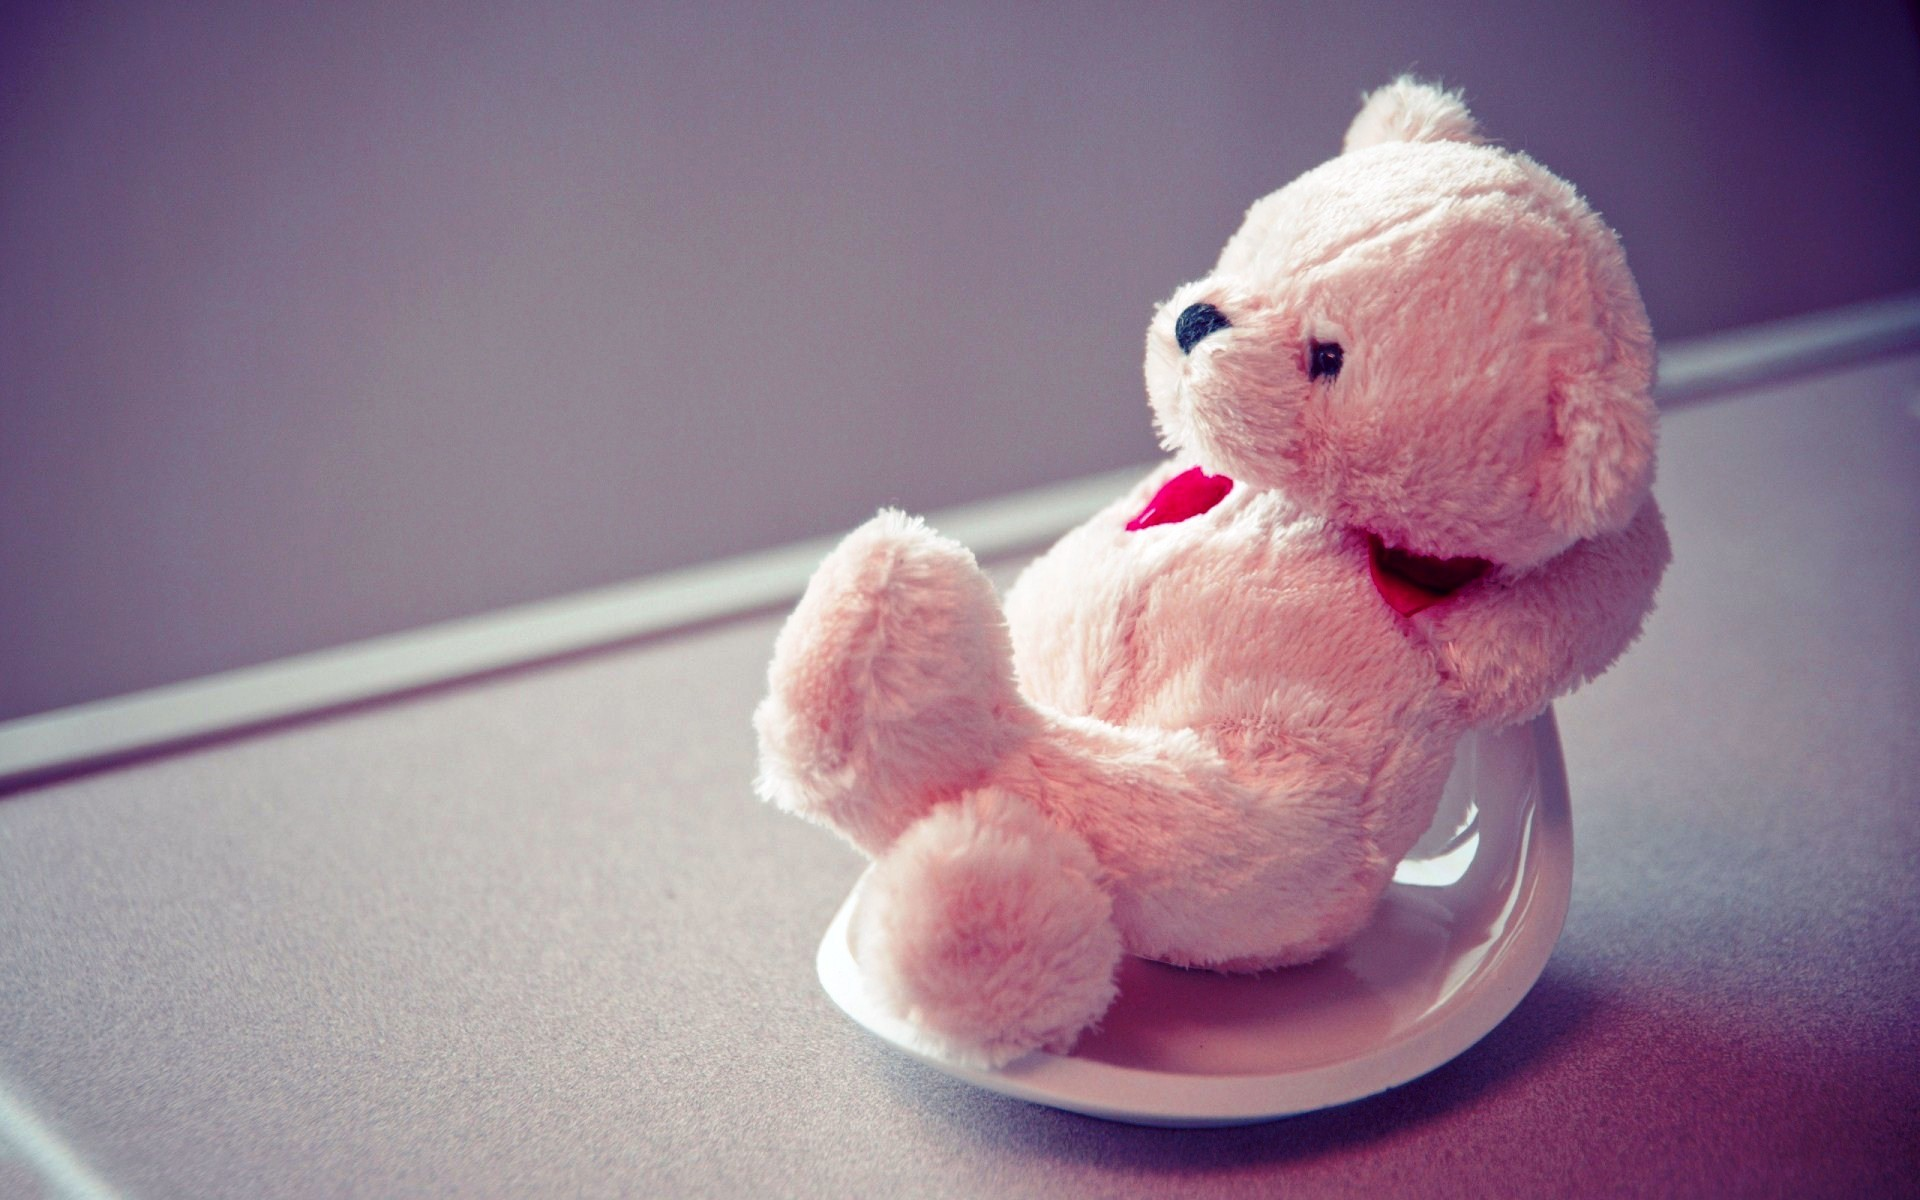 Cute Teddy Bear Wallpapers ①